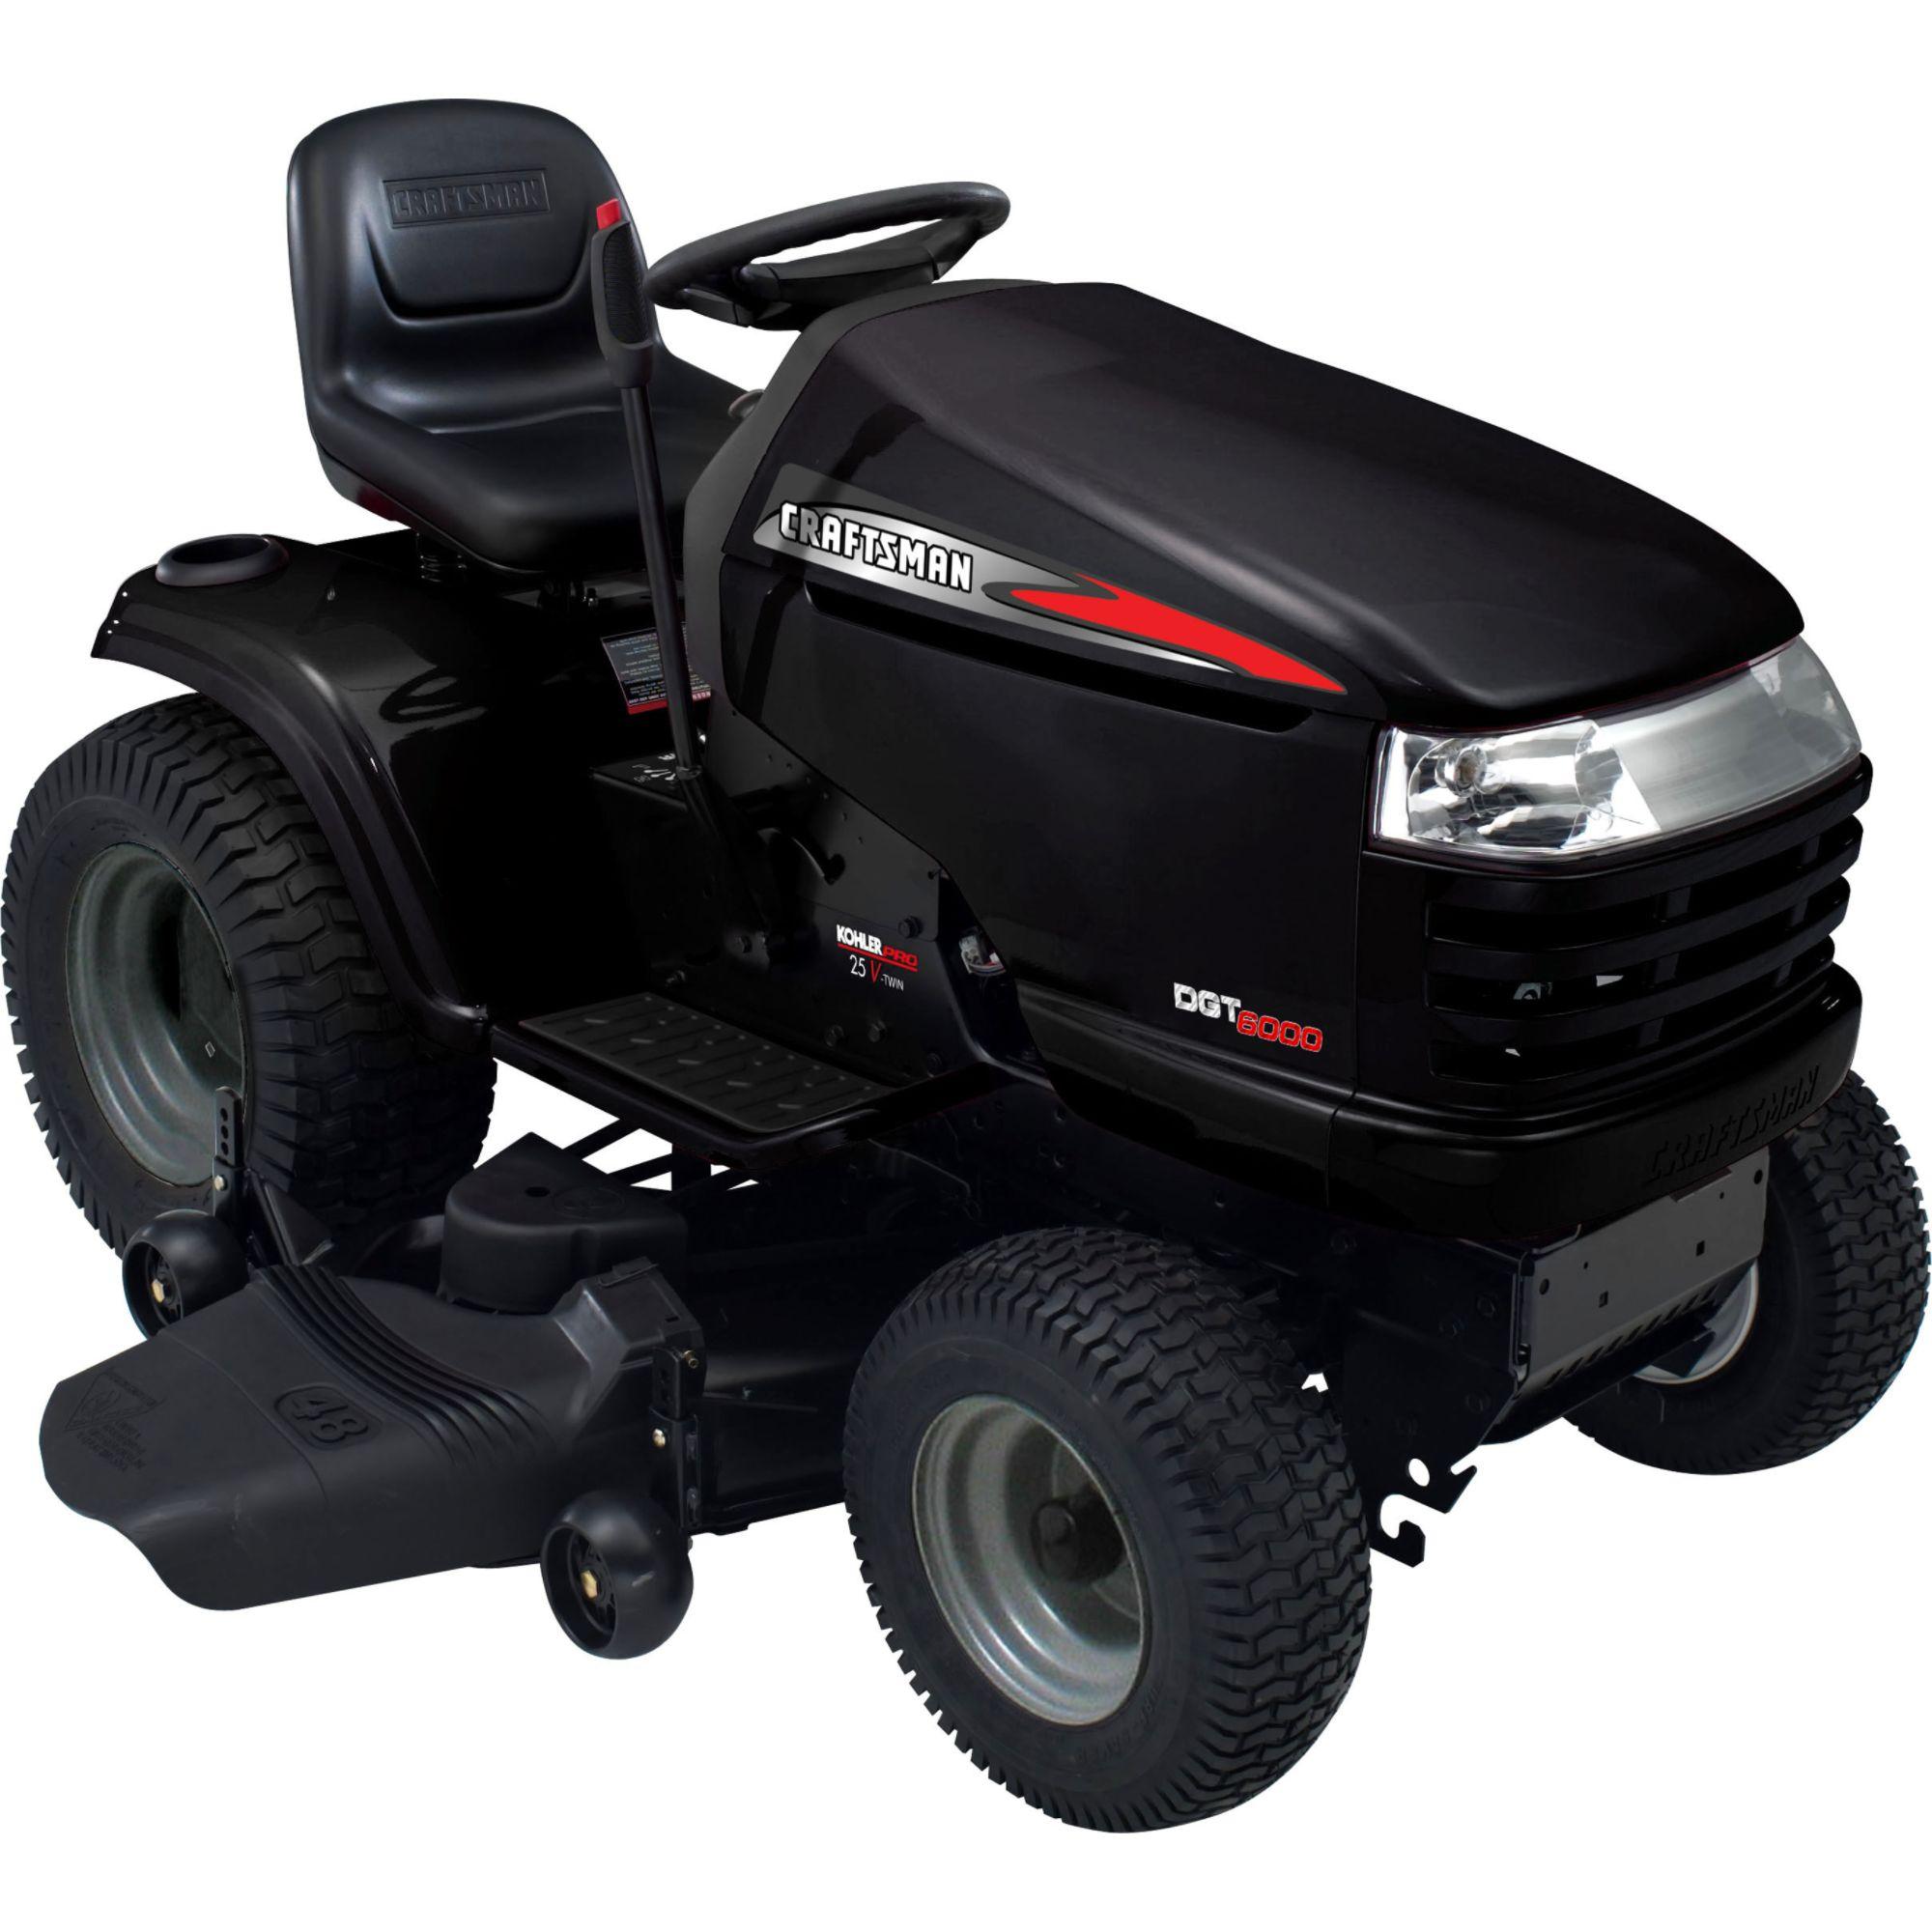 small resolution of craftsman gt5000 garden tractor parts designs